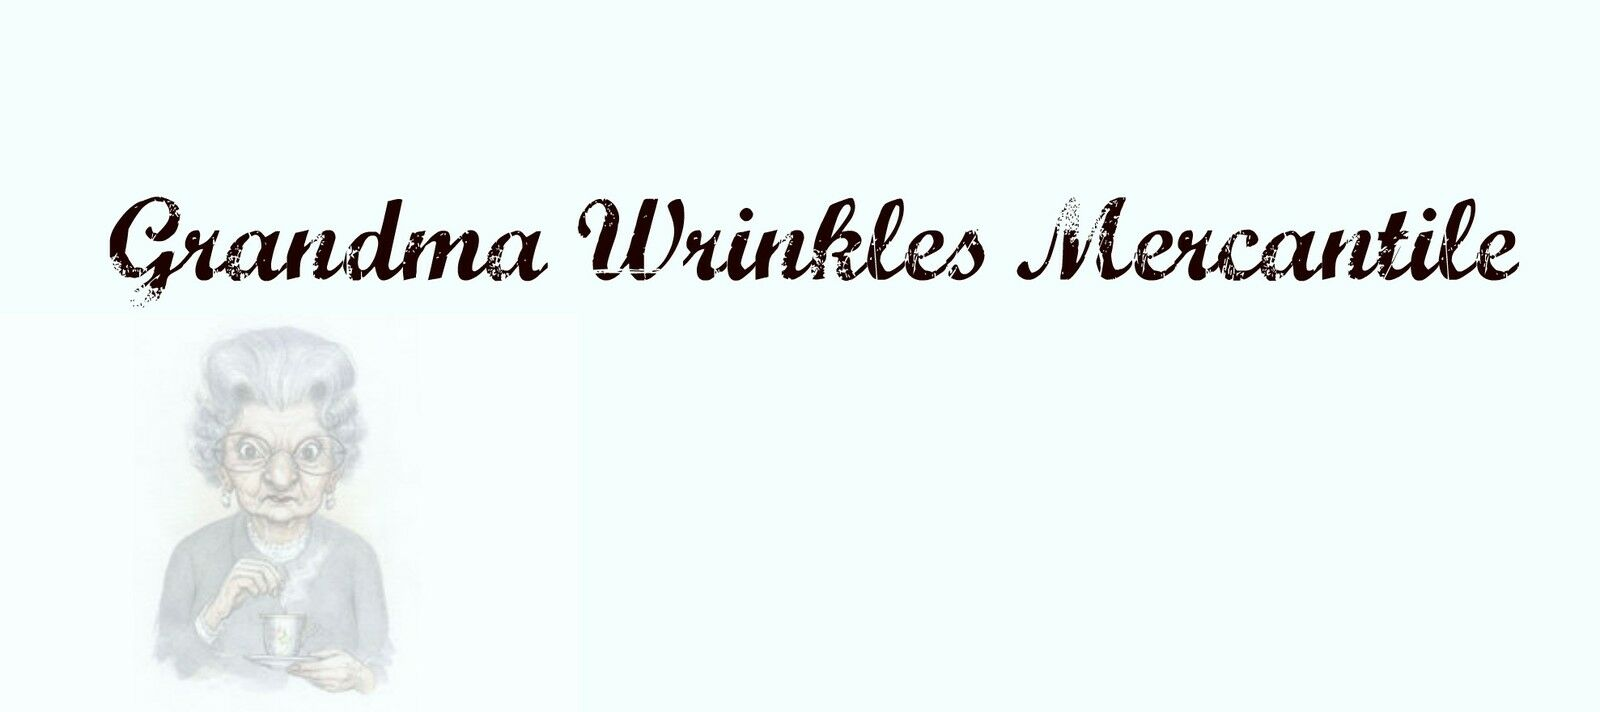 Grandma Wrinkles Mercantile